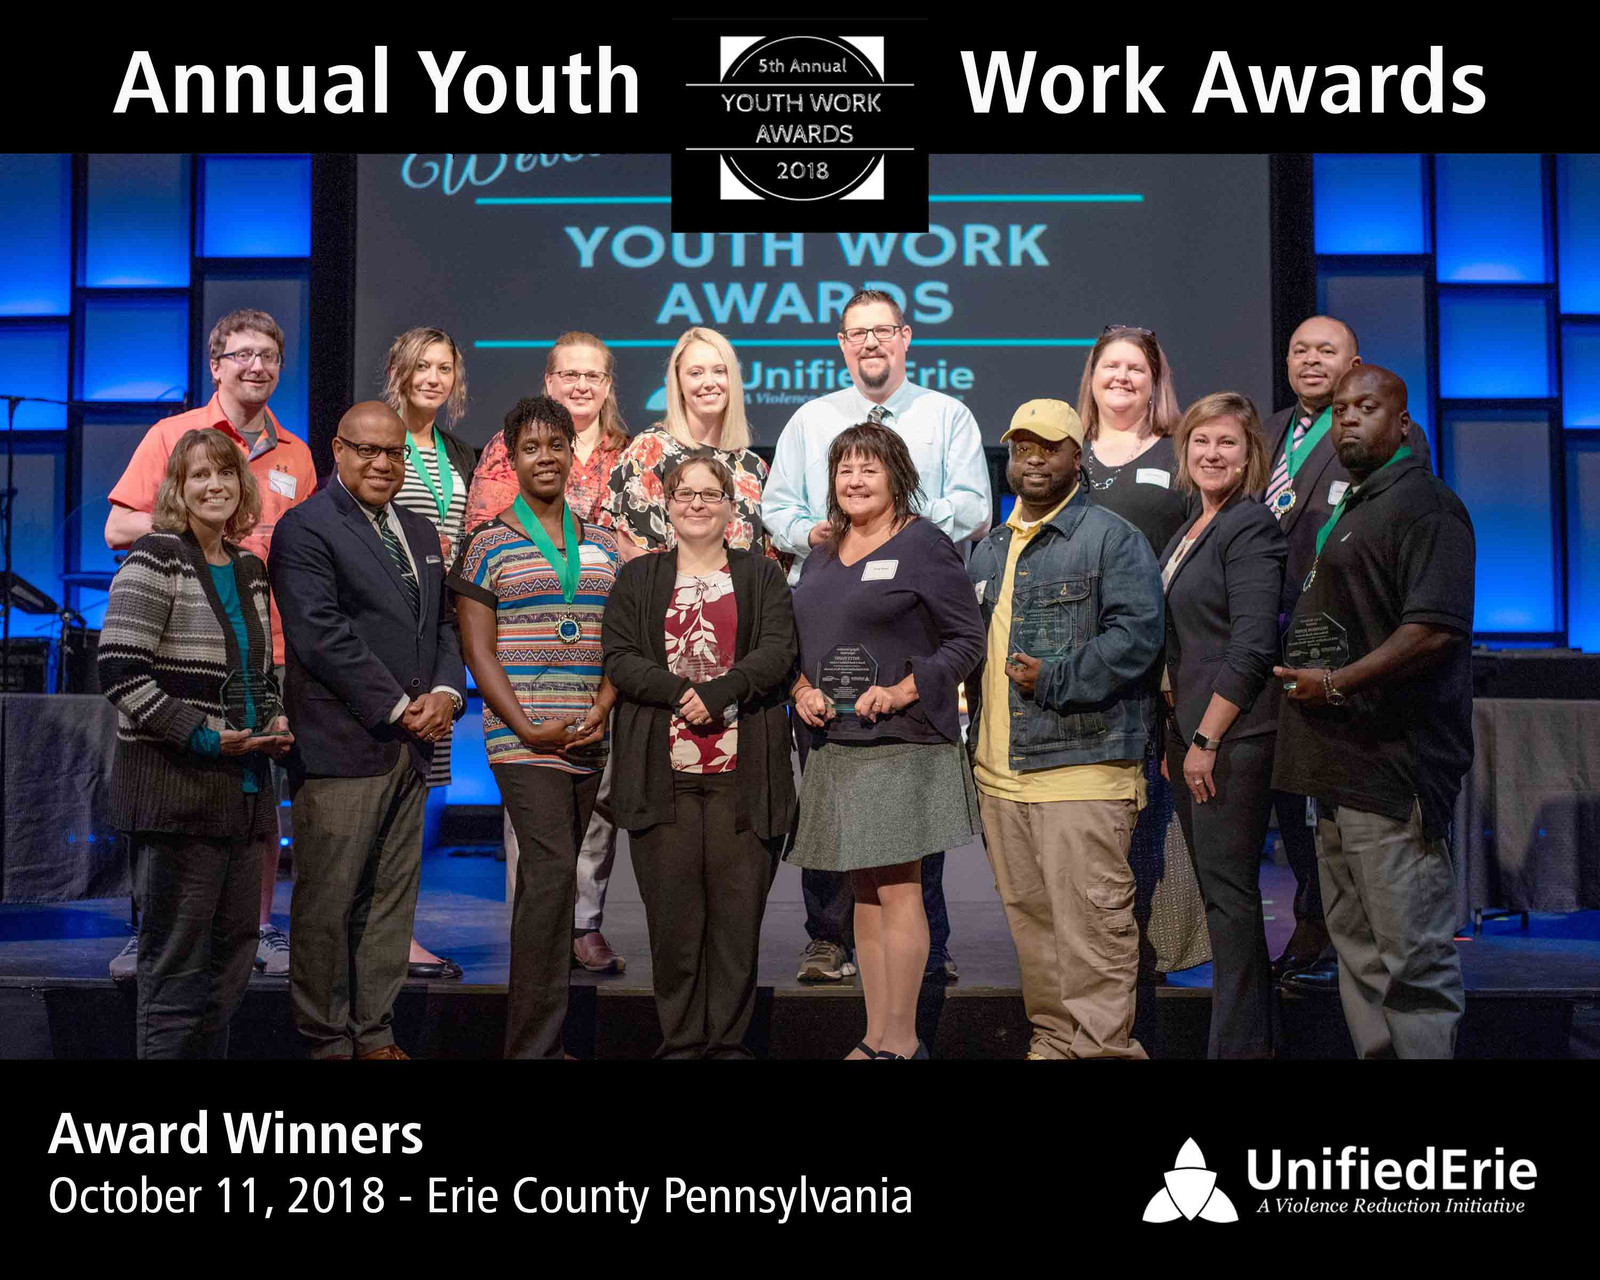 iamunifiederie youth work awards